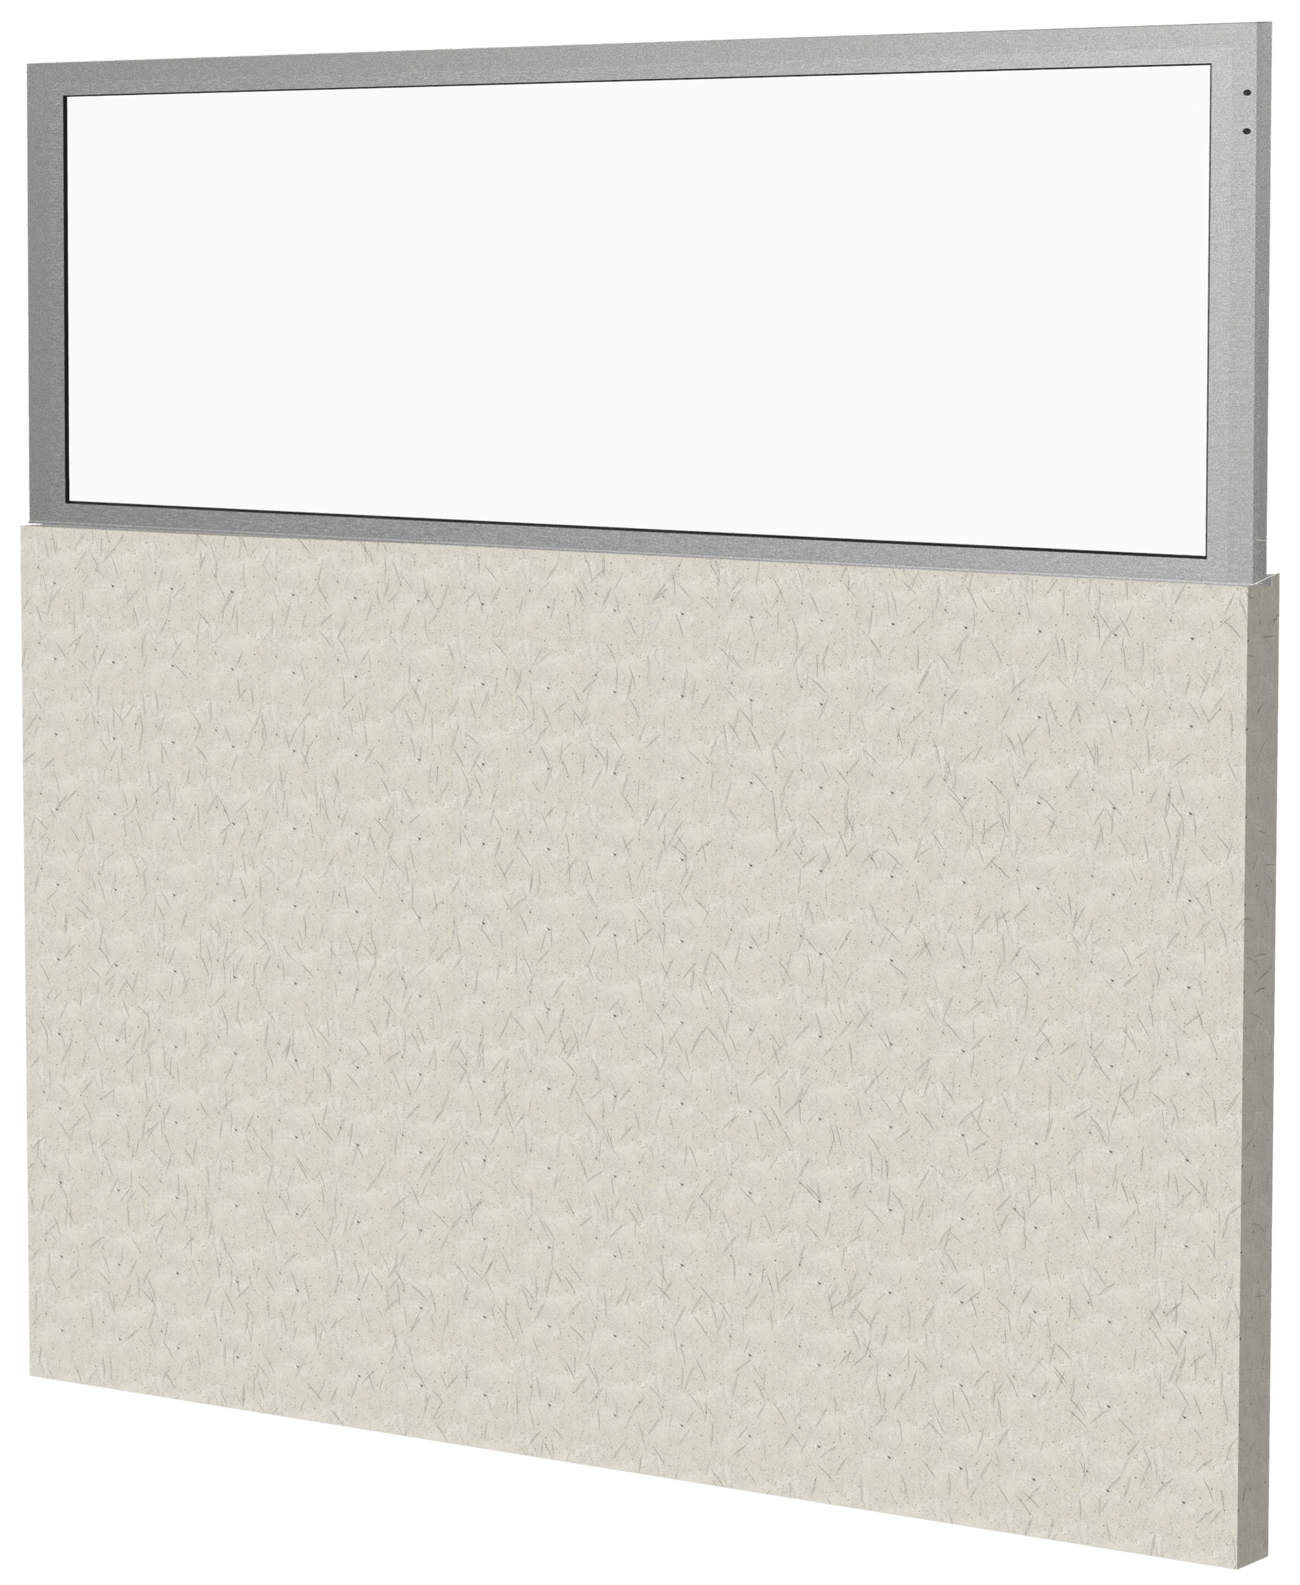 "24"" Glass Flag for Cement Masonry Unit (CMU)"